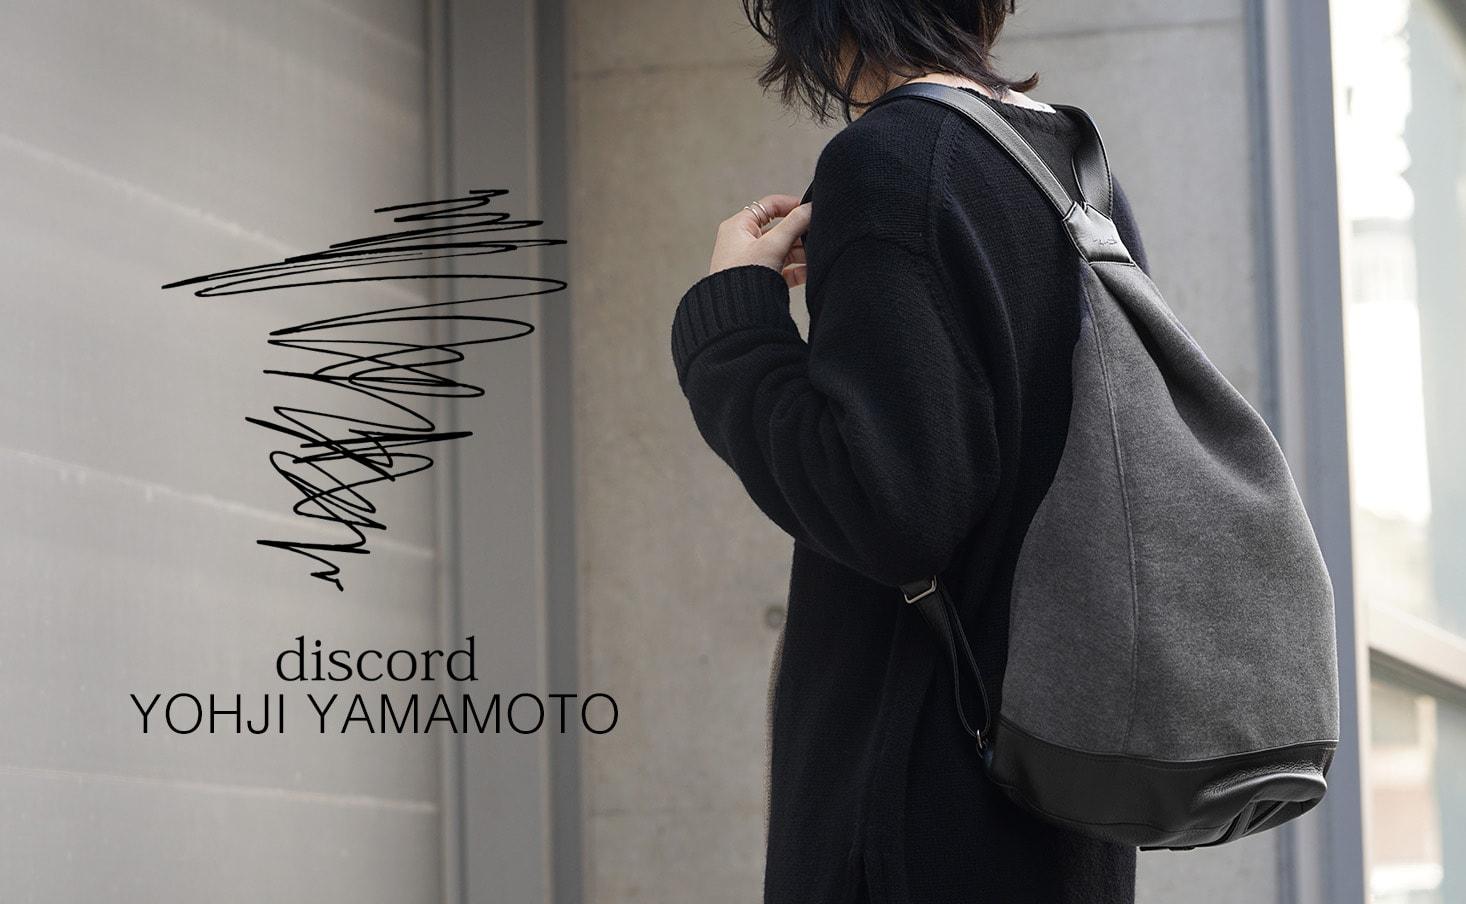 discord yohji yamamoto 18-19 aw collection